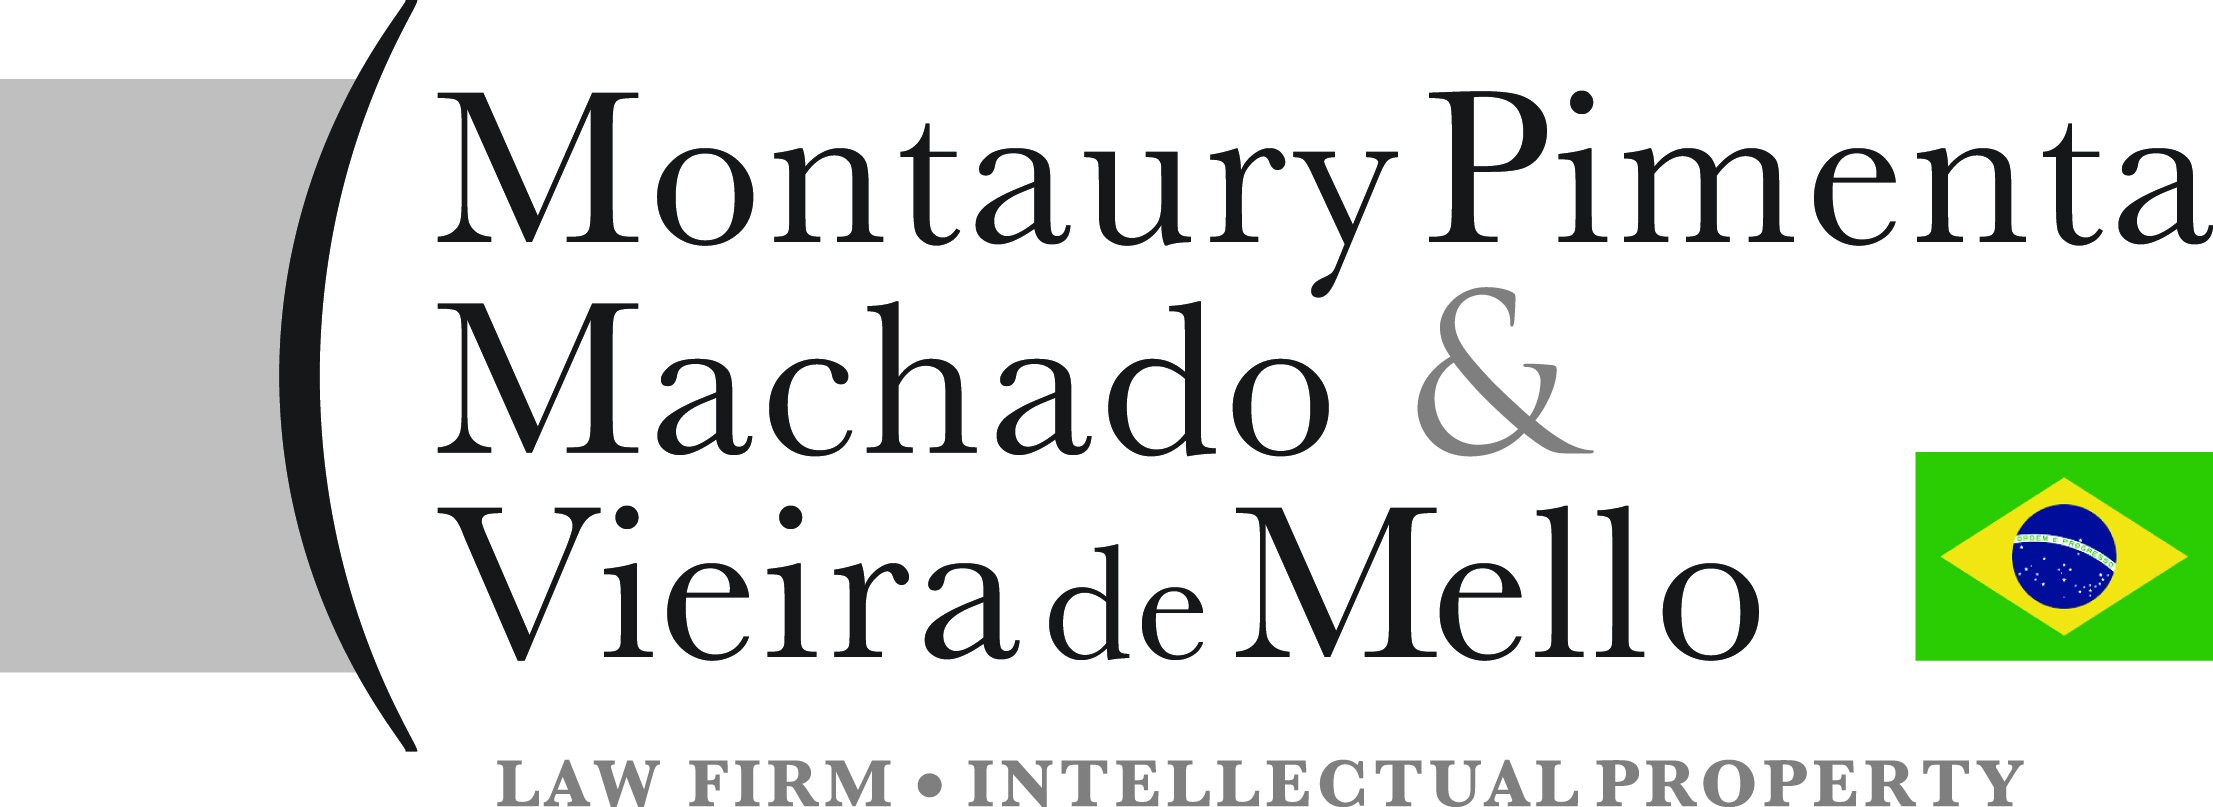 Montaury Pimenta, Machado & Vieira de Mello